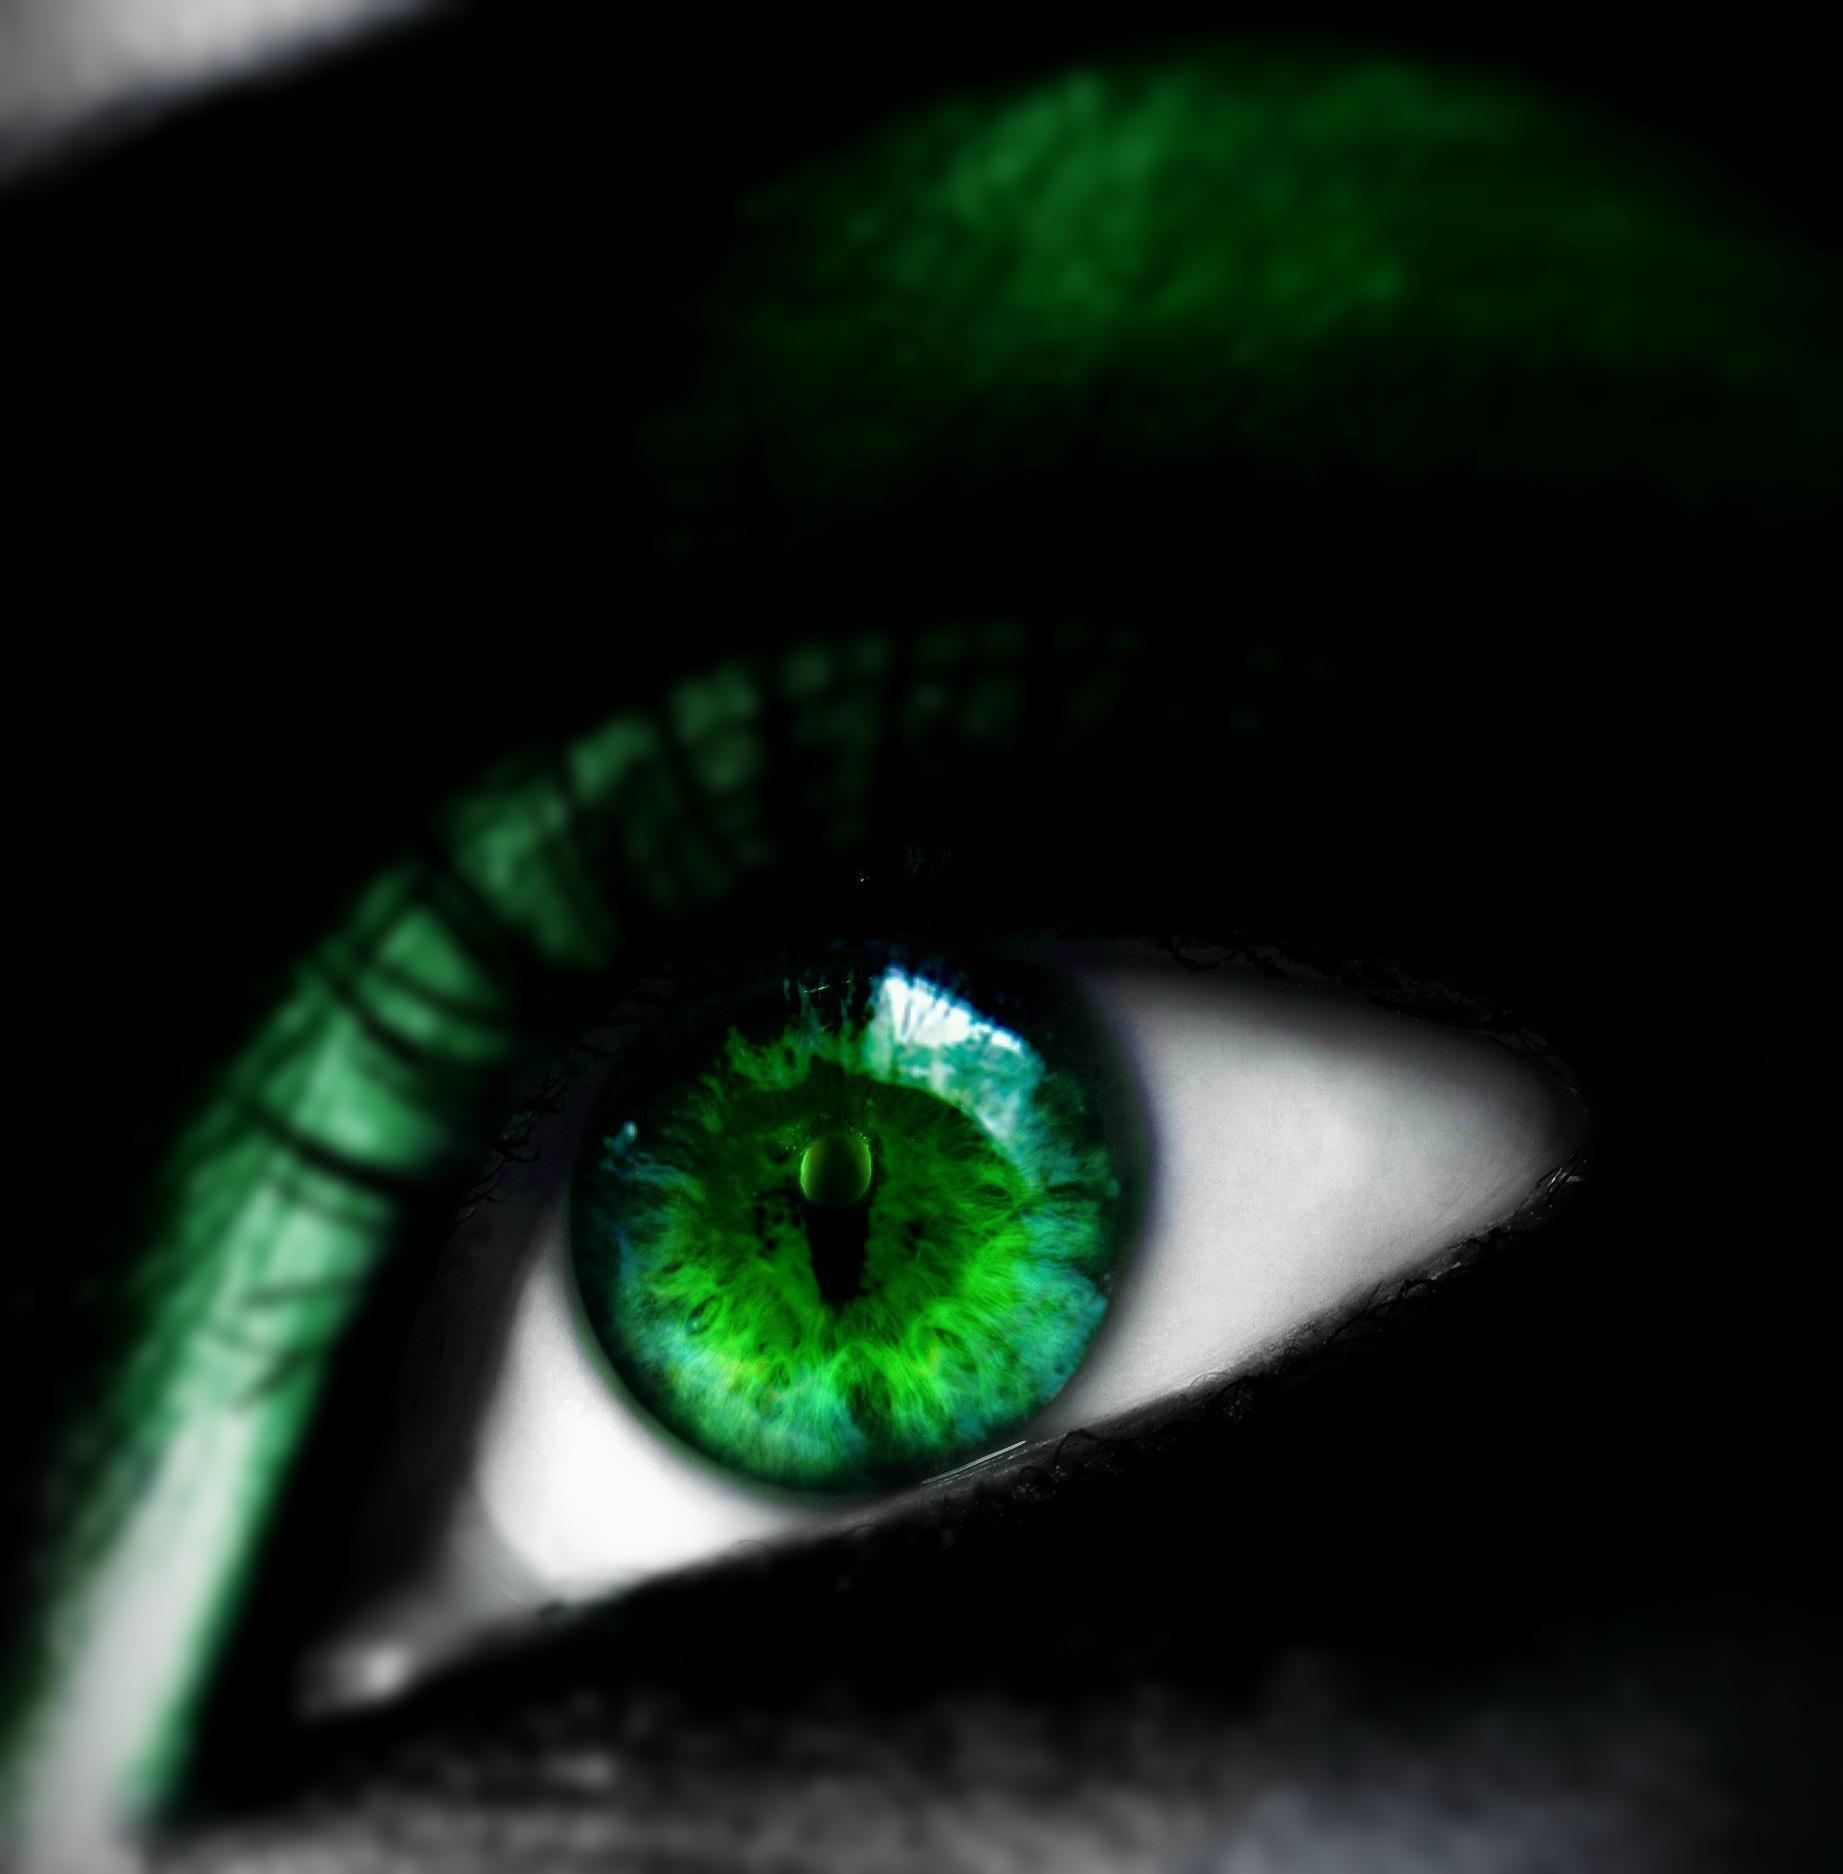 Poison Ivy Eye by Emerald City Digital